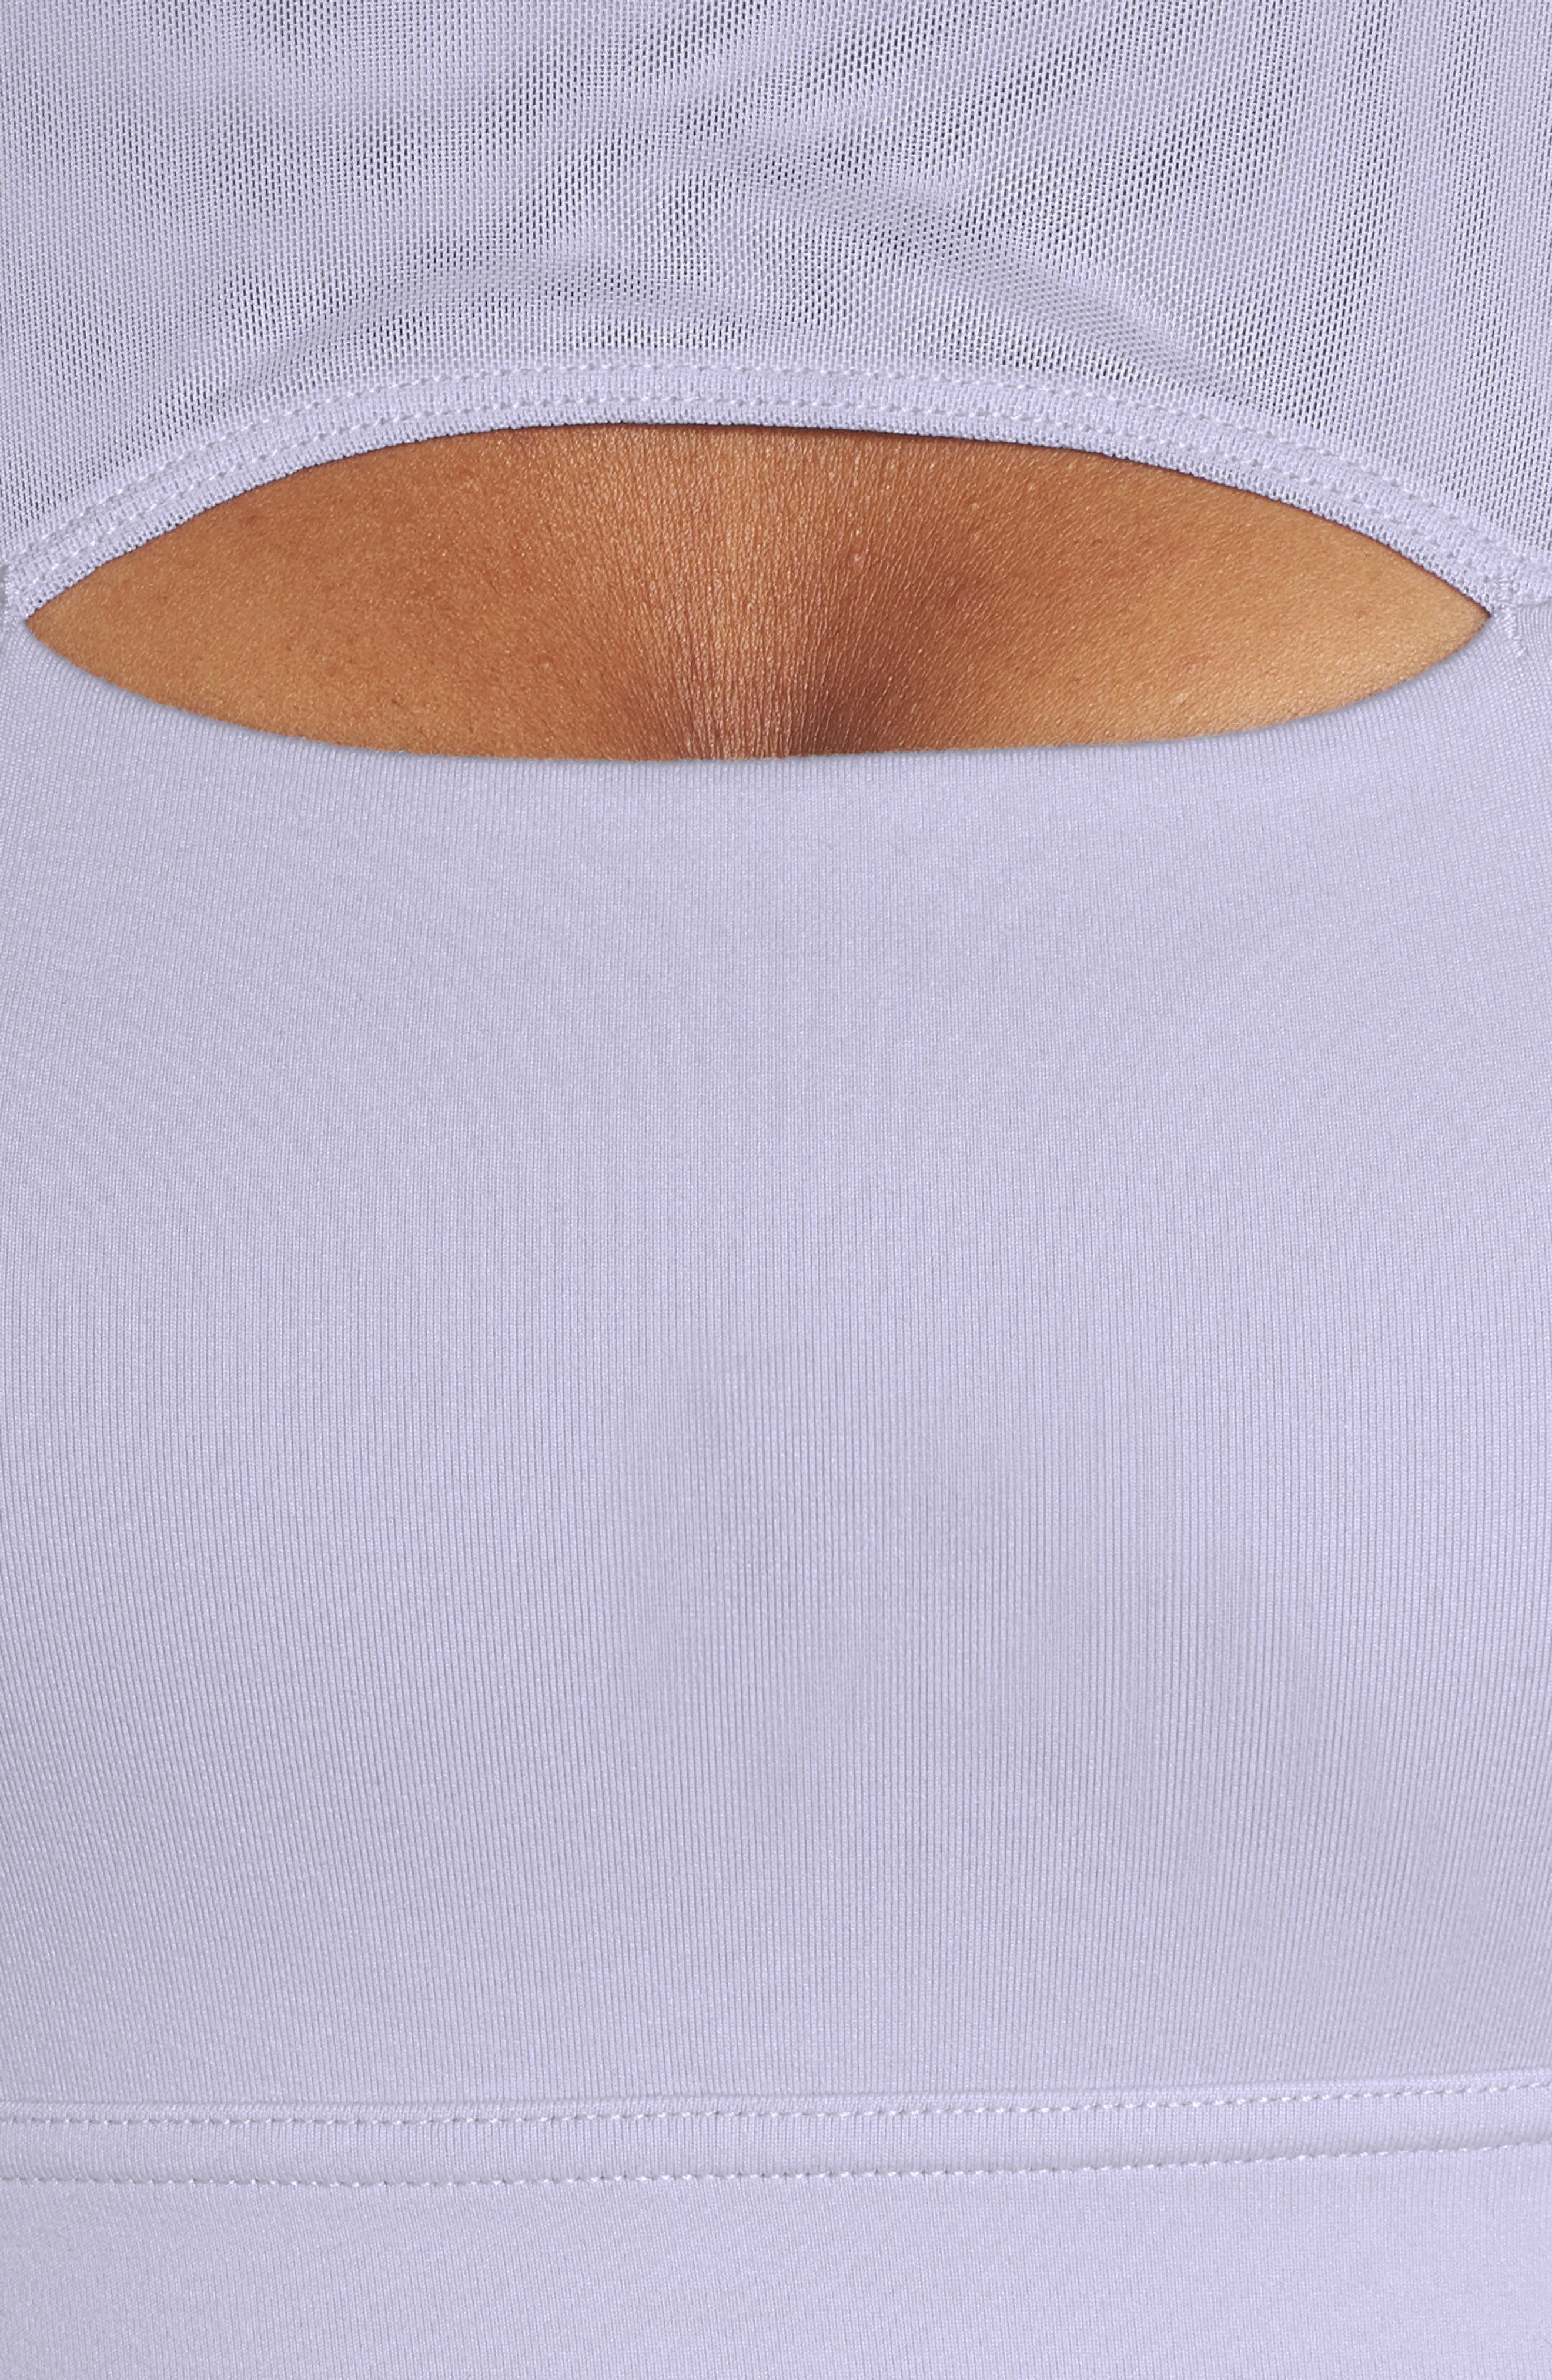 Lana Recycled Sports Bralette,                             Alternate thumbnail 6, color,                             PURPLE THISTLE